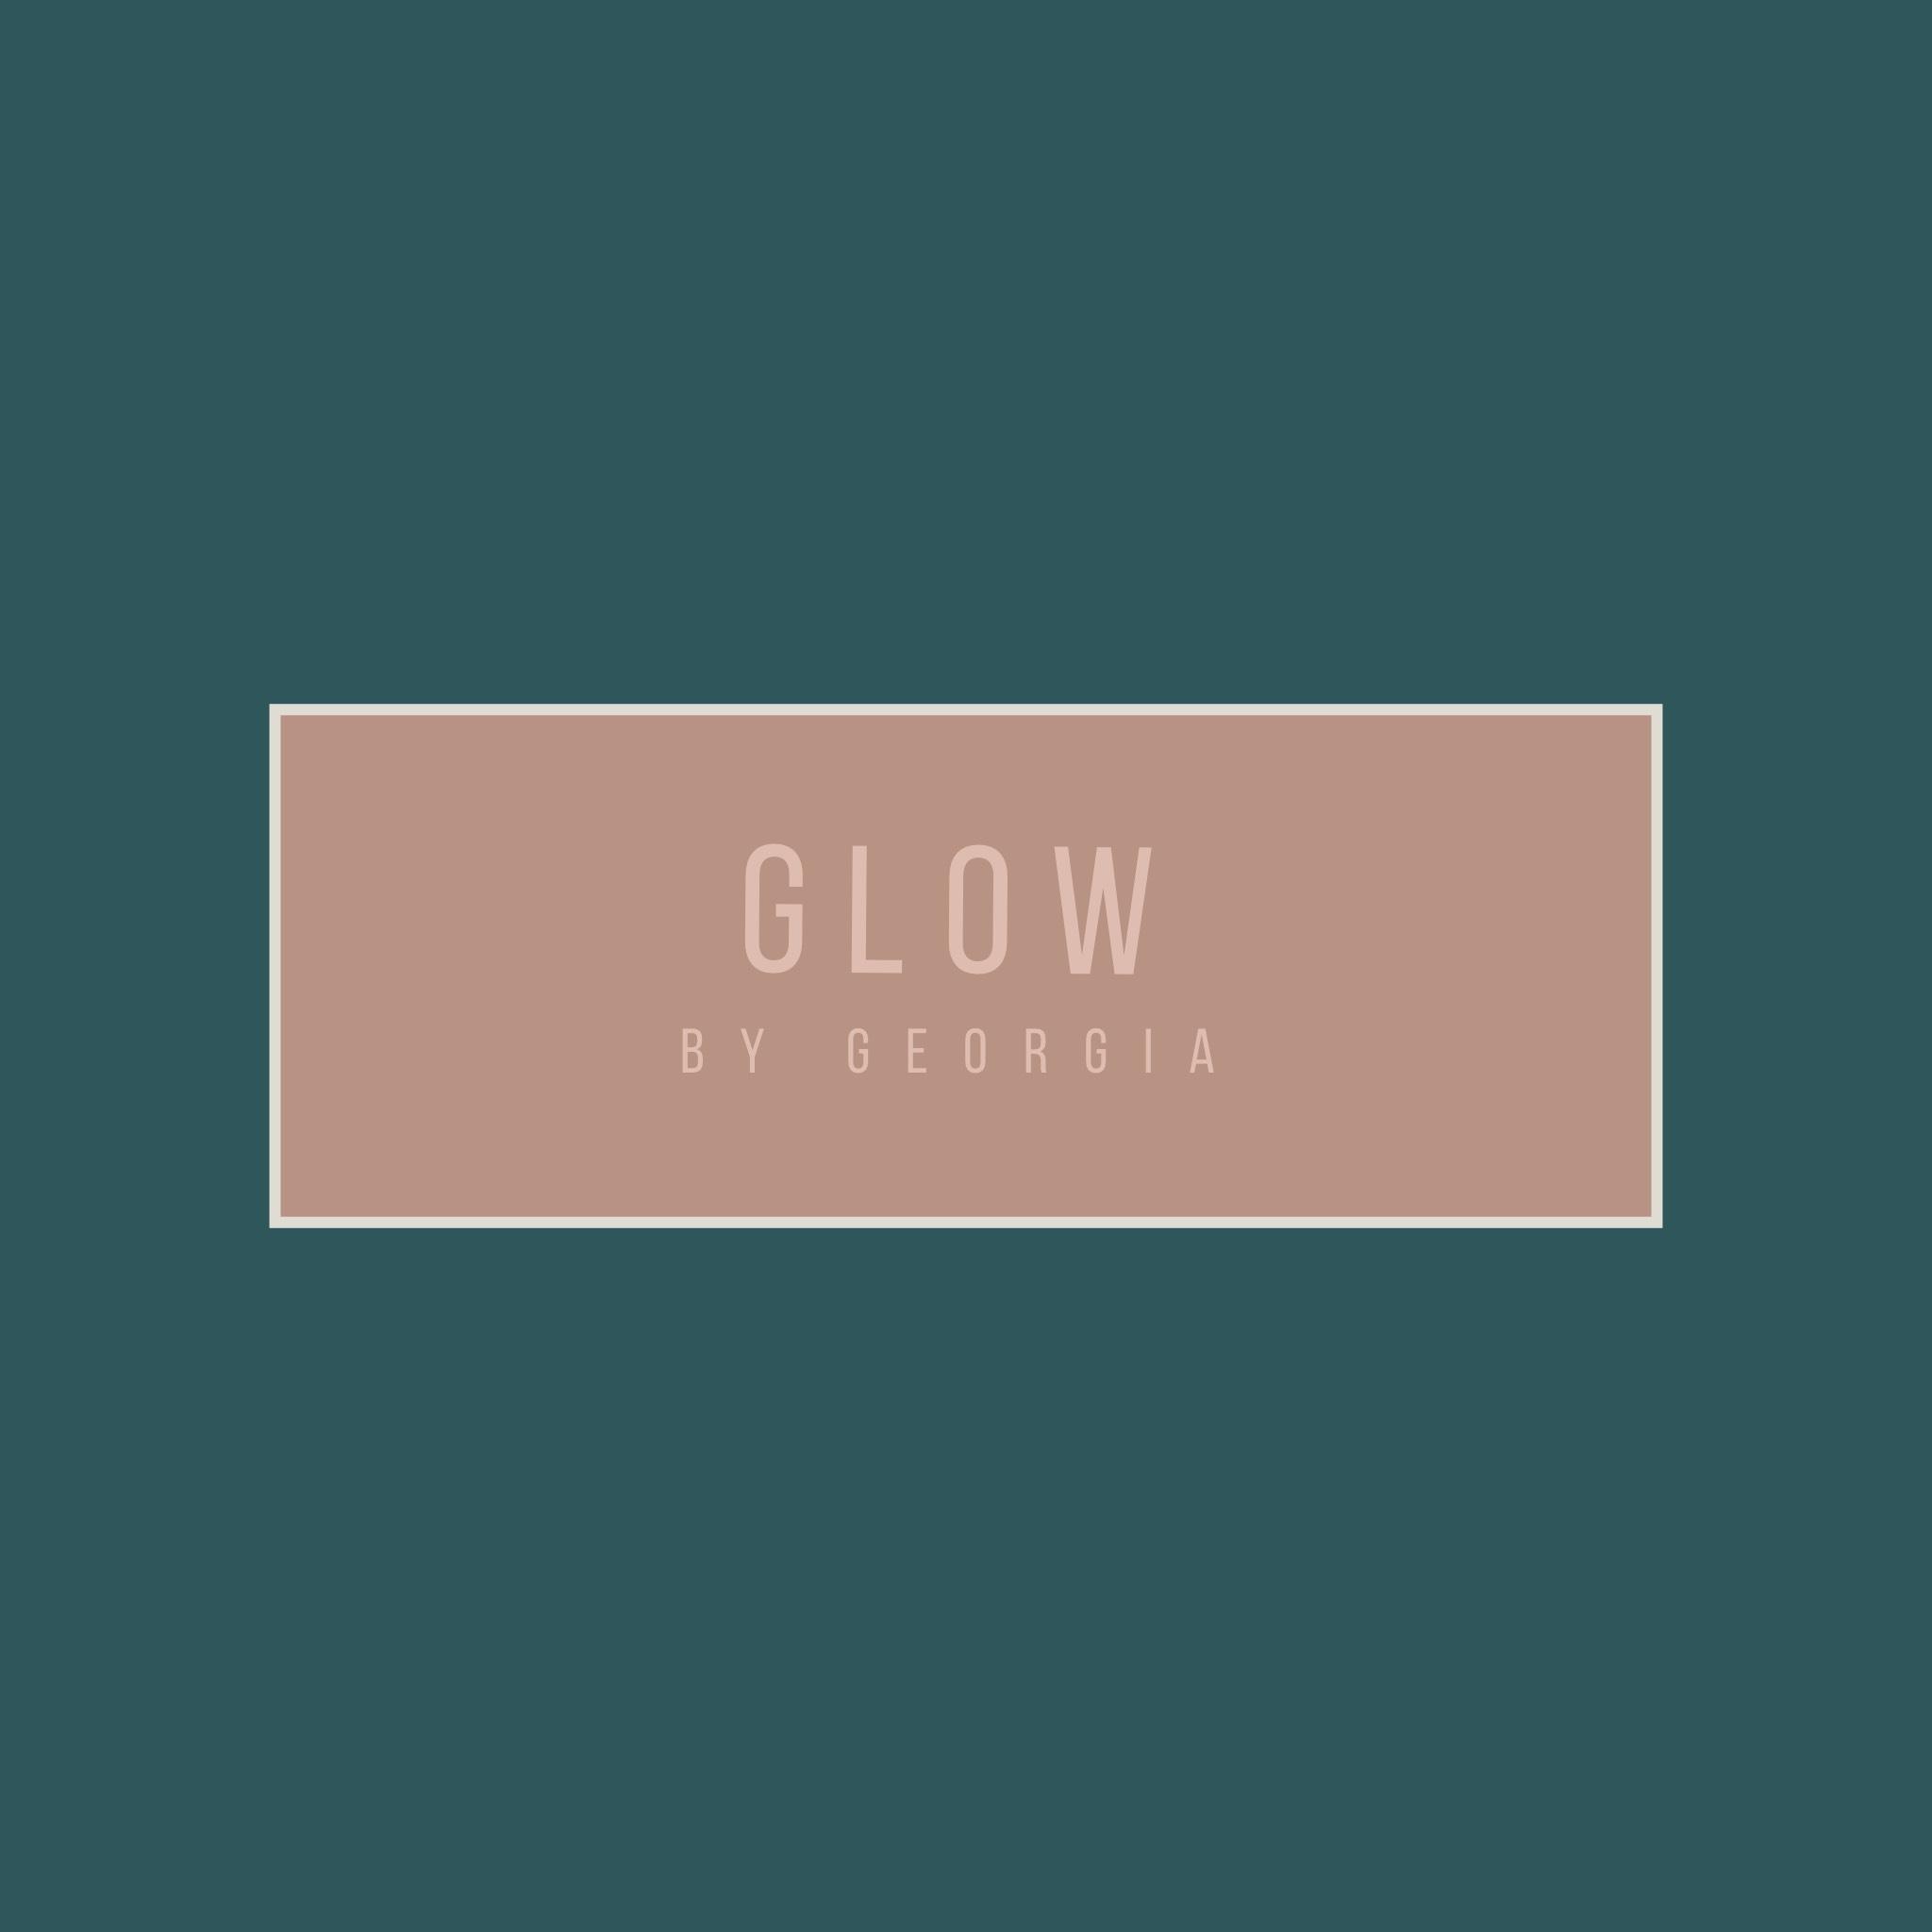 GlowByGeorgia_logo